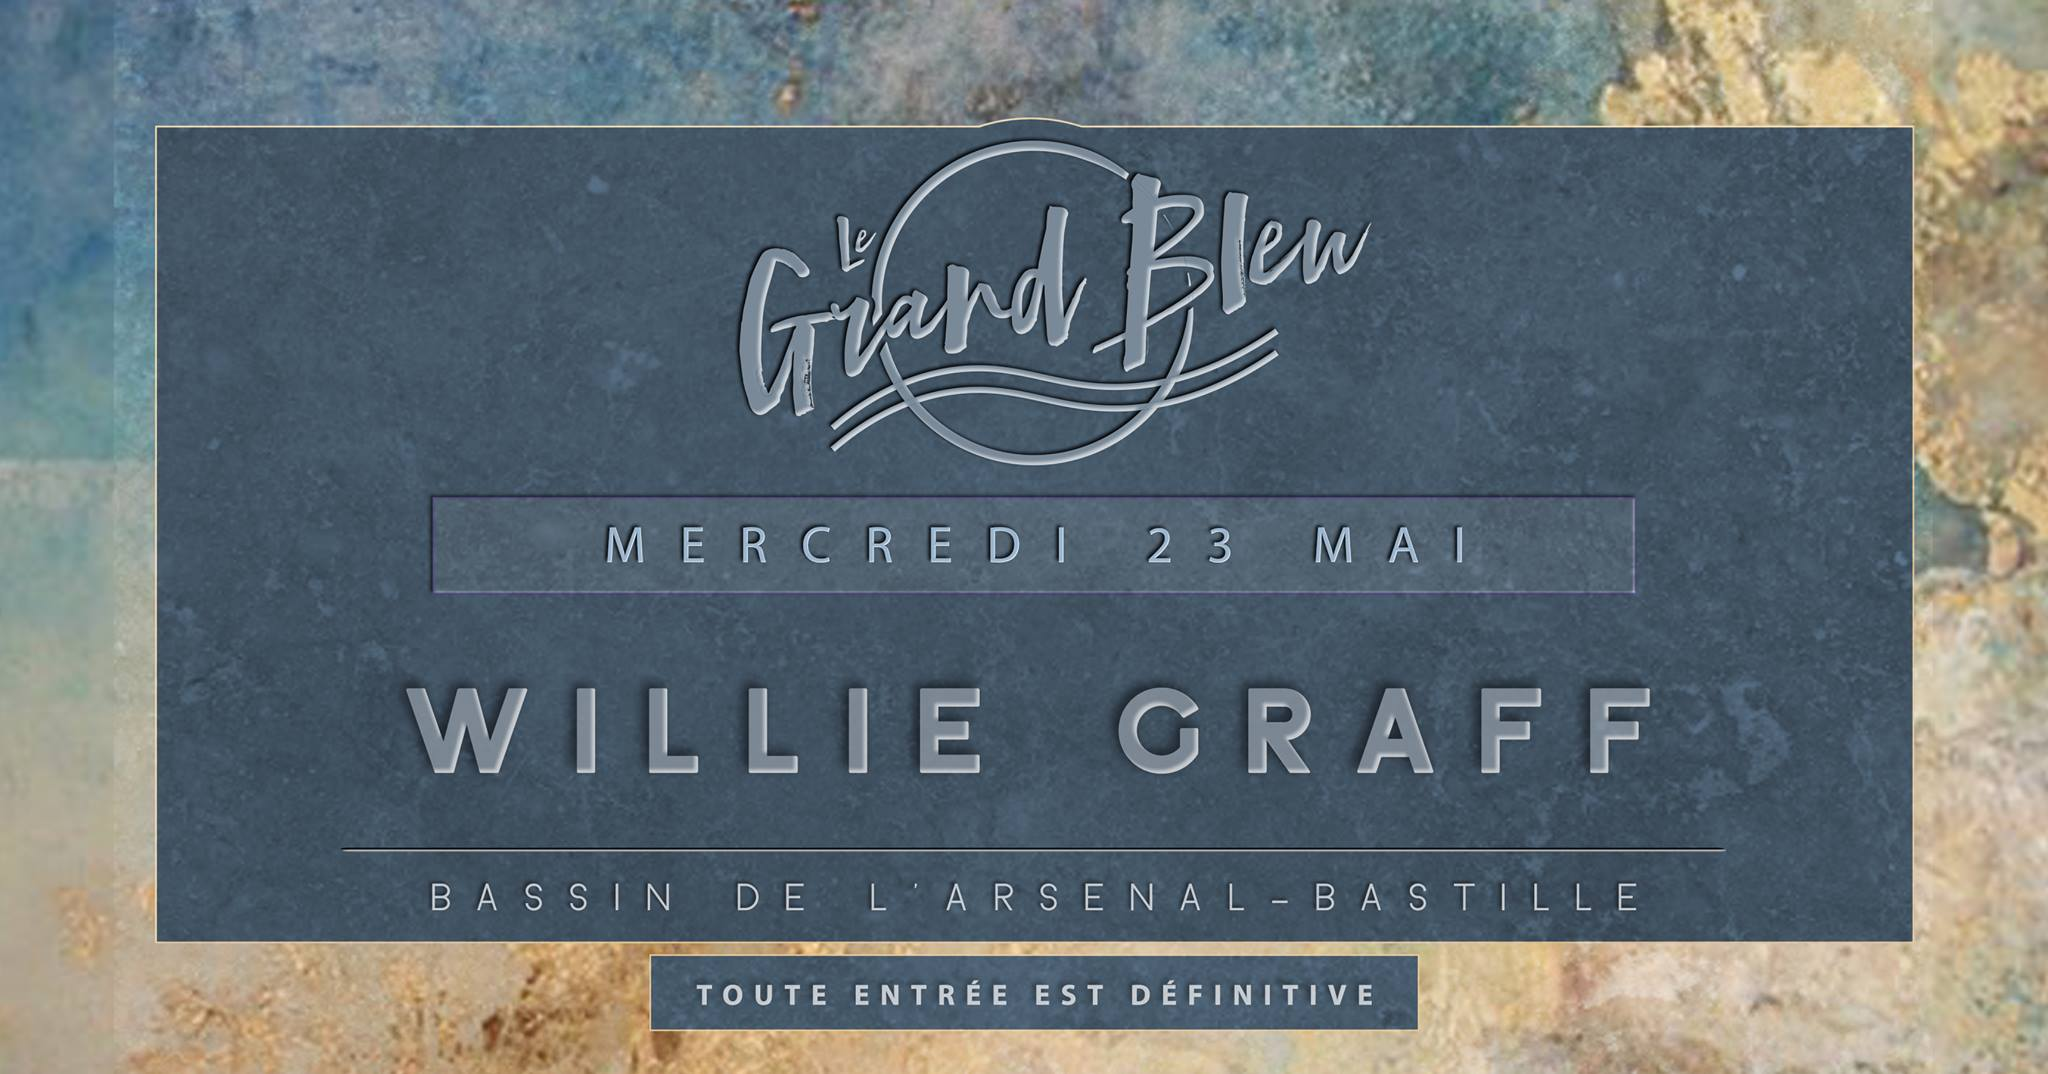 Willie Graff - @Grand Bleu